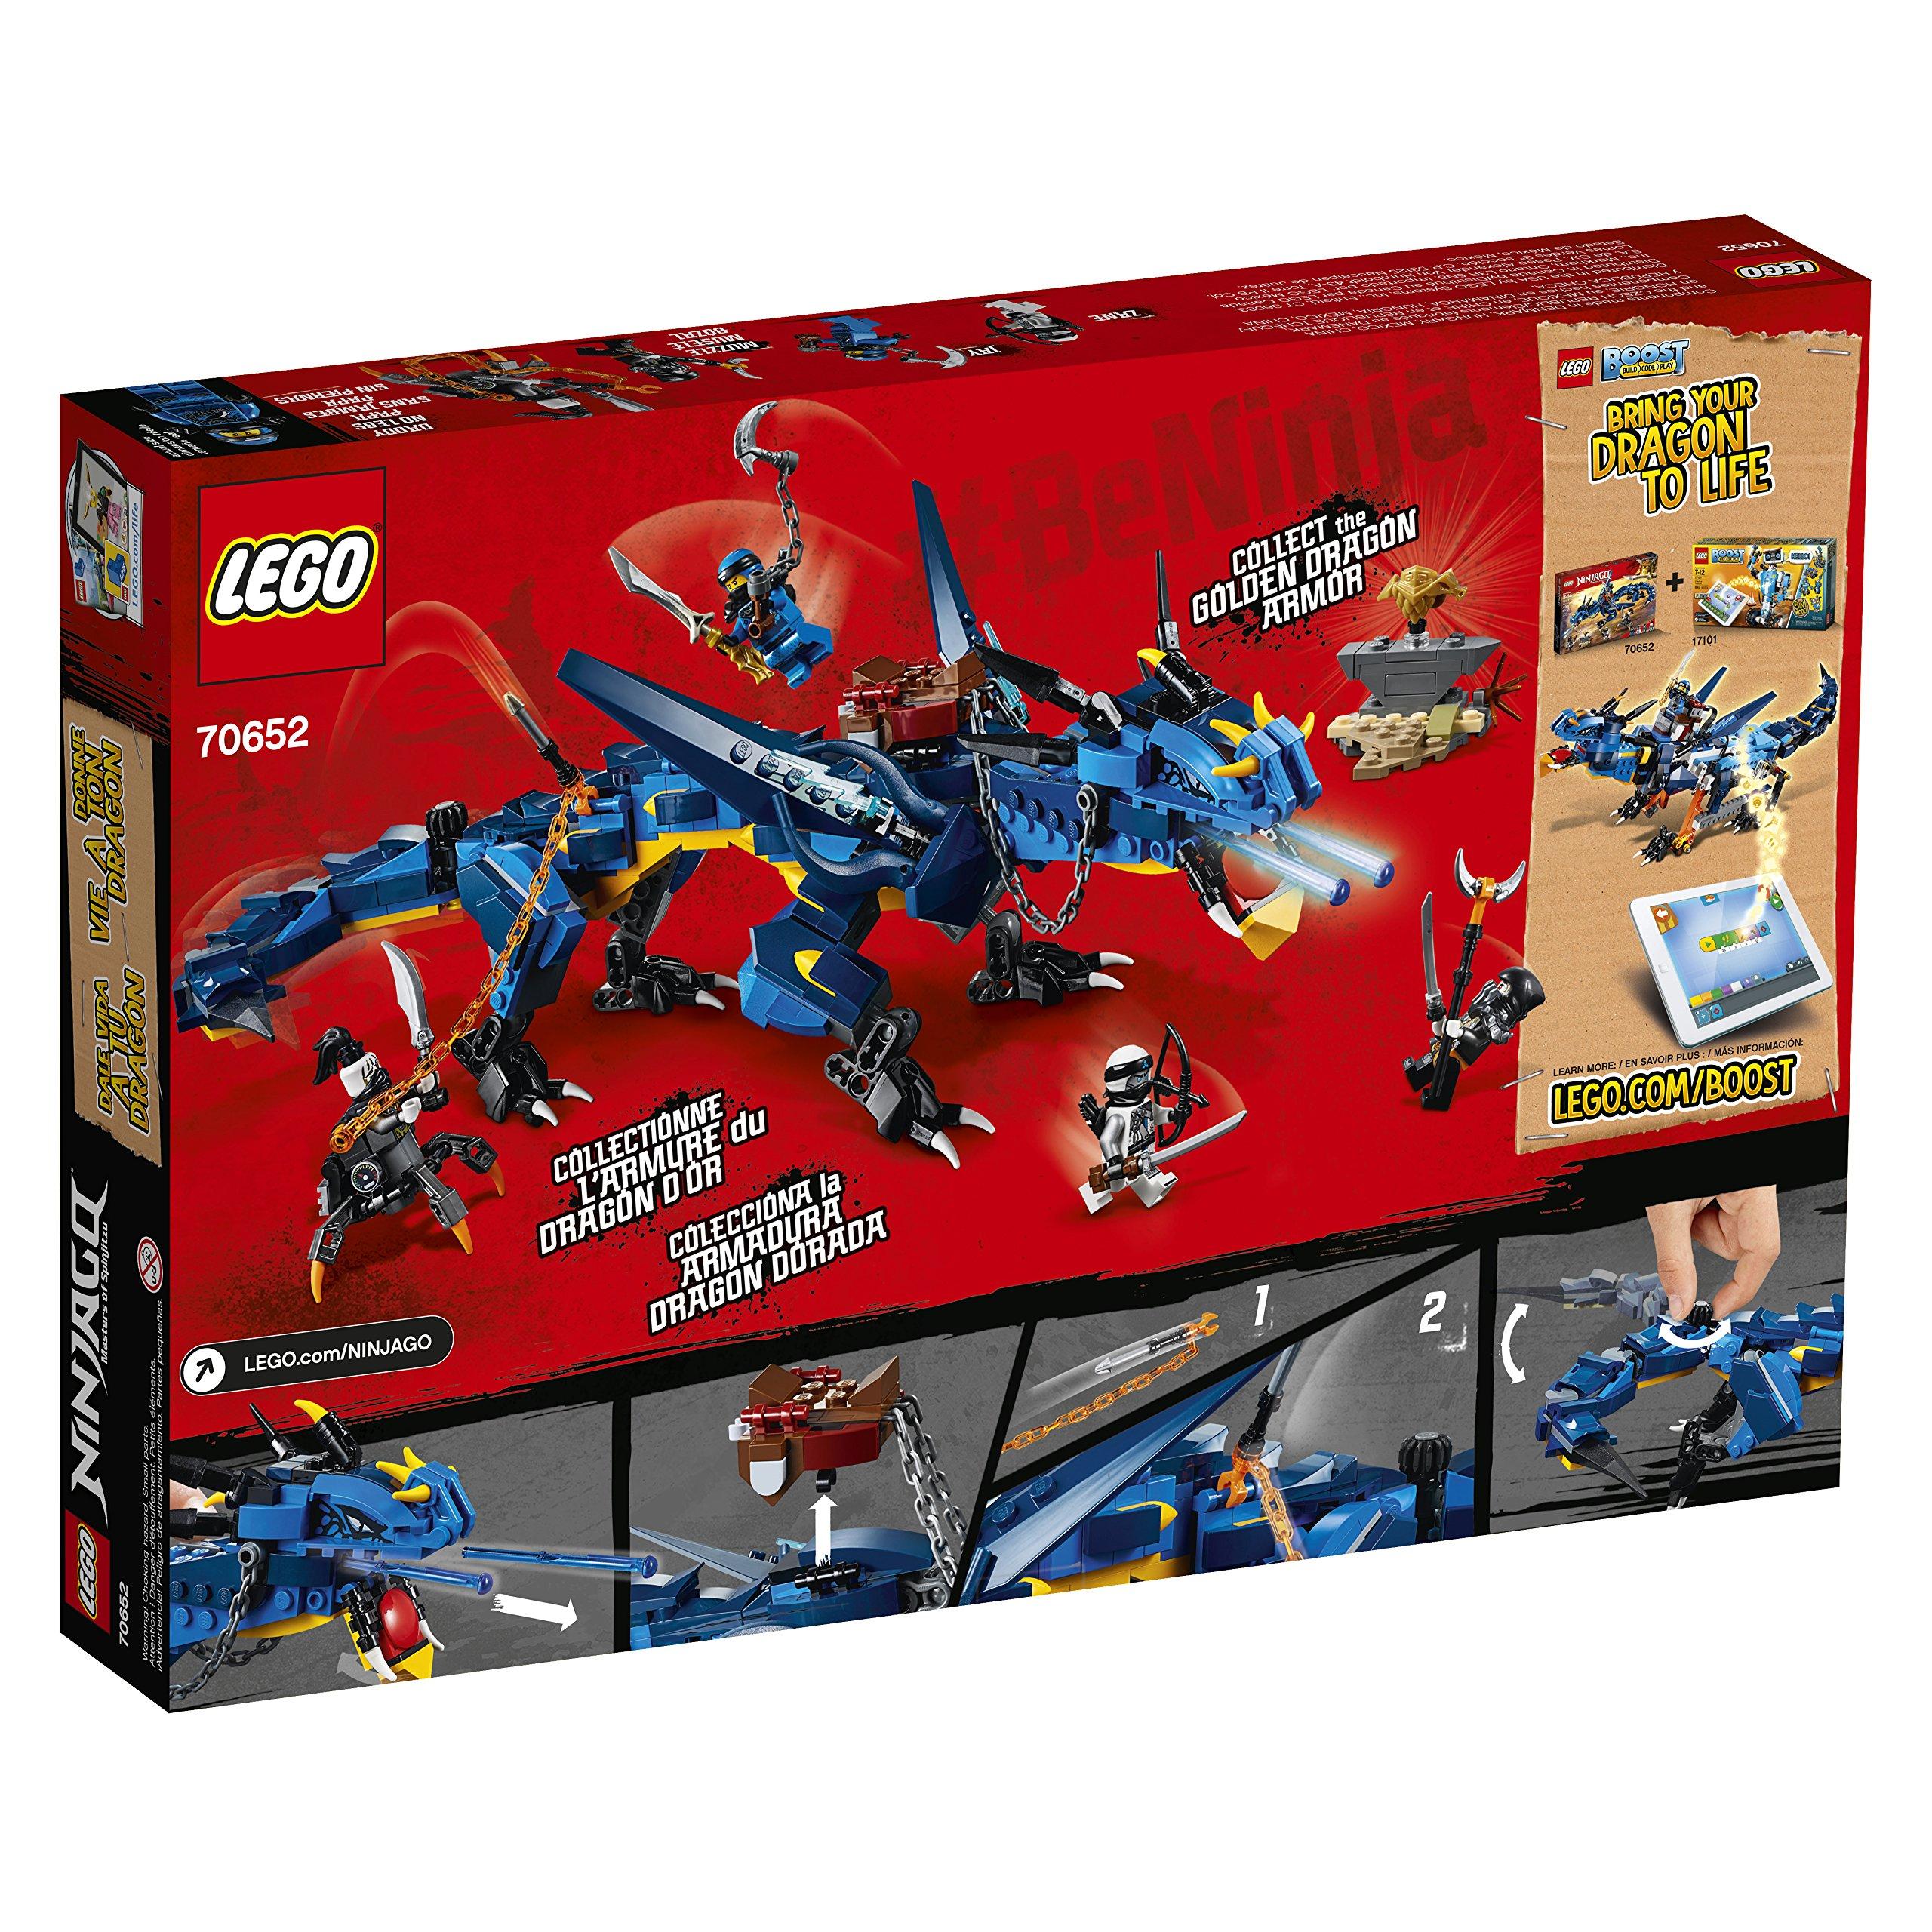 Amazon.com: LEGO: Ninjas